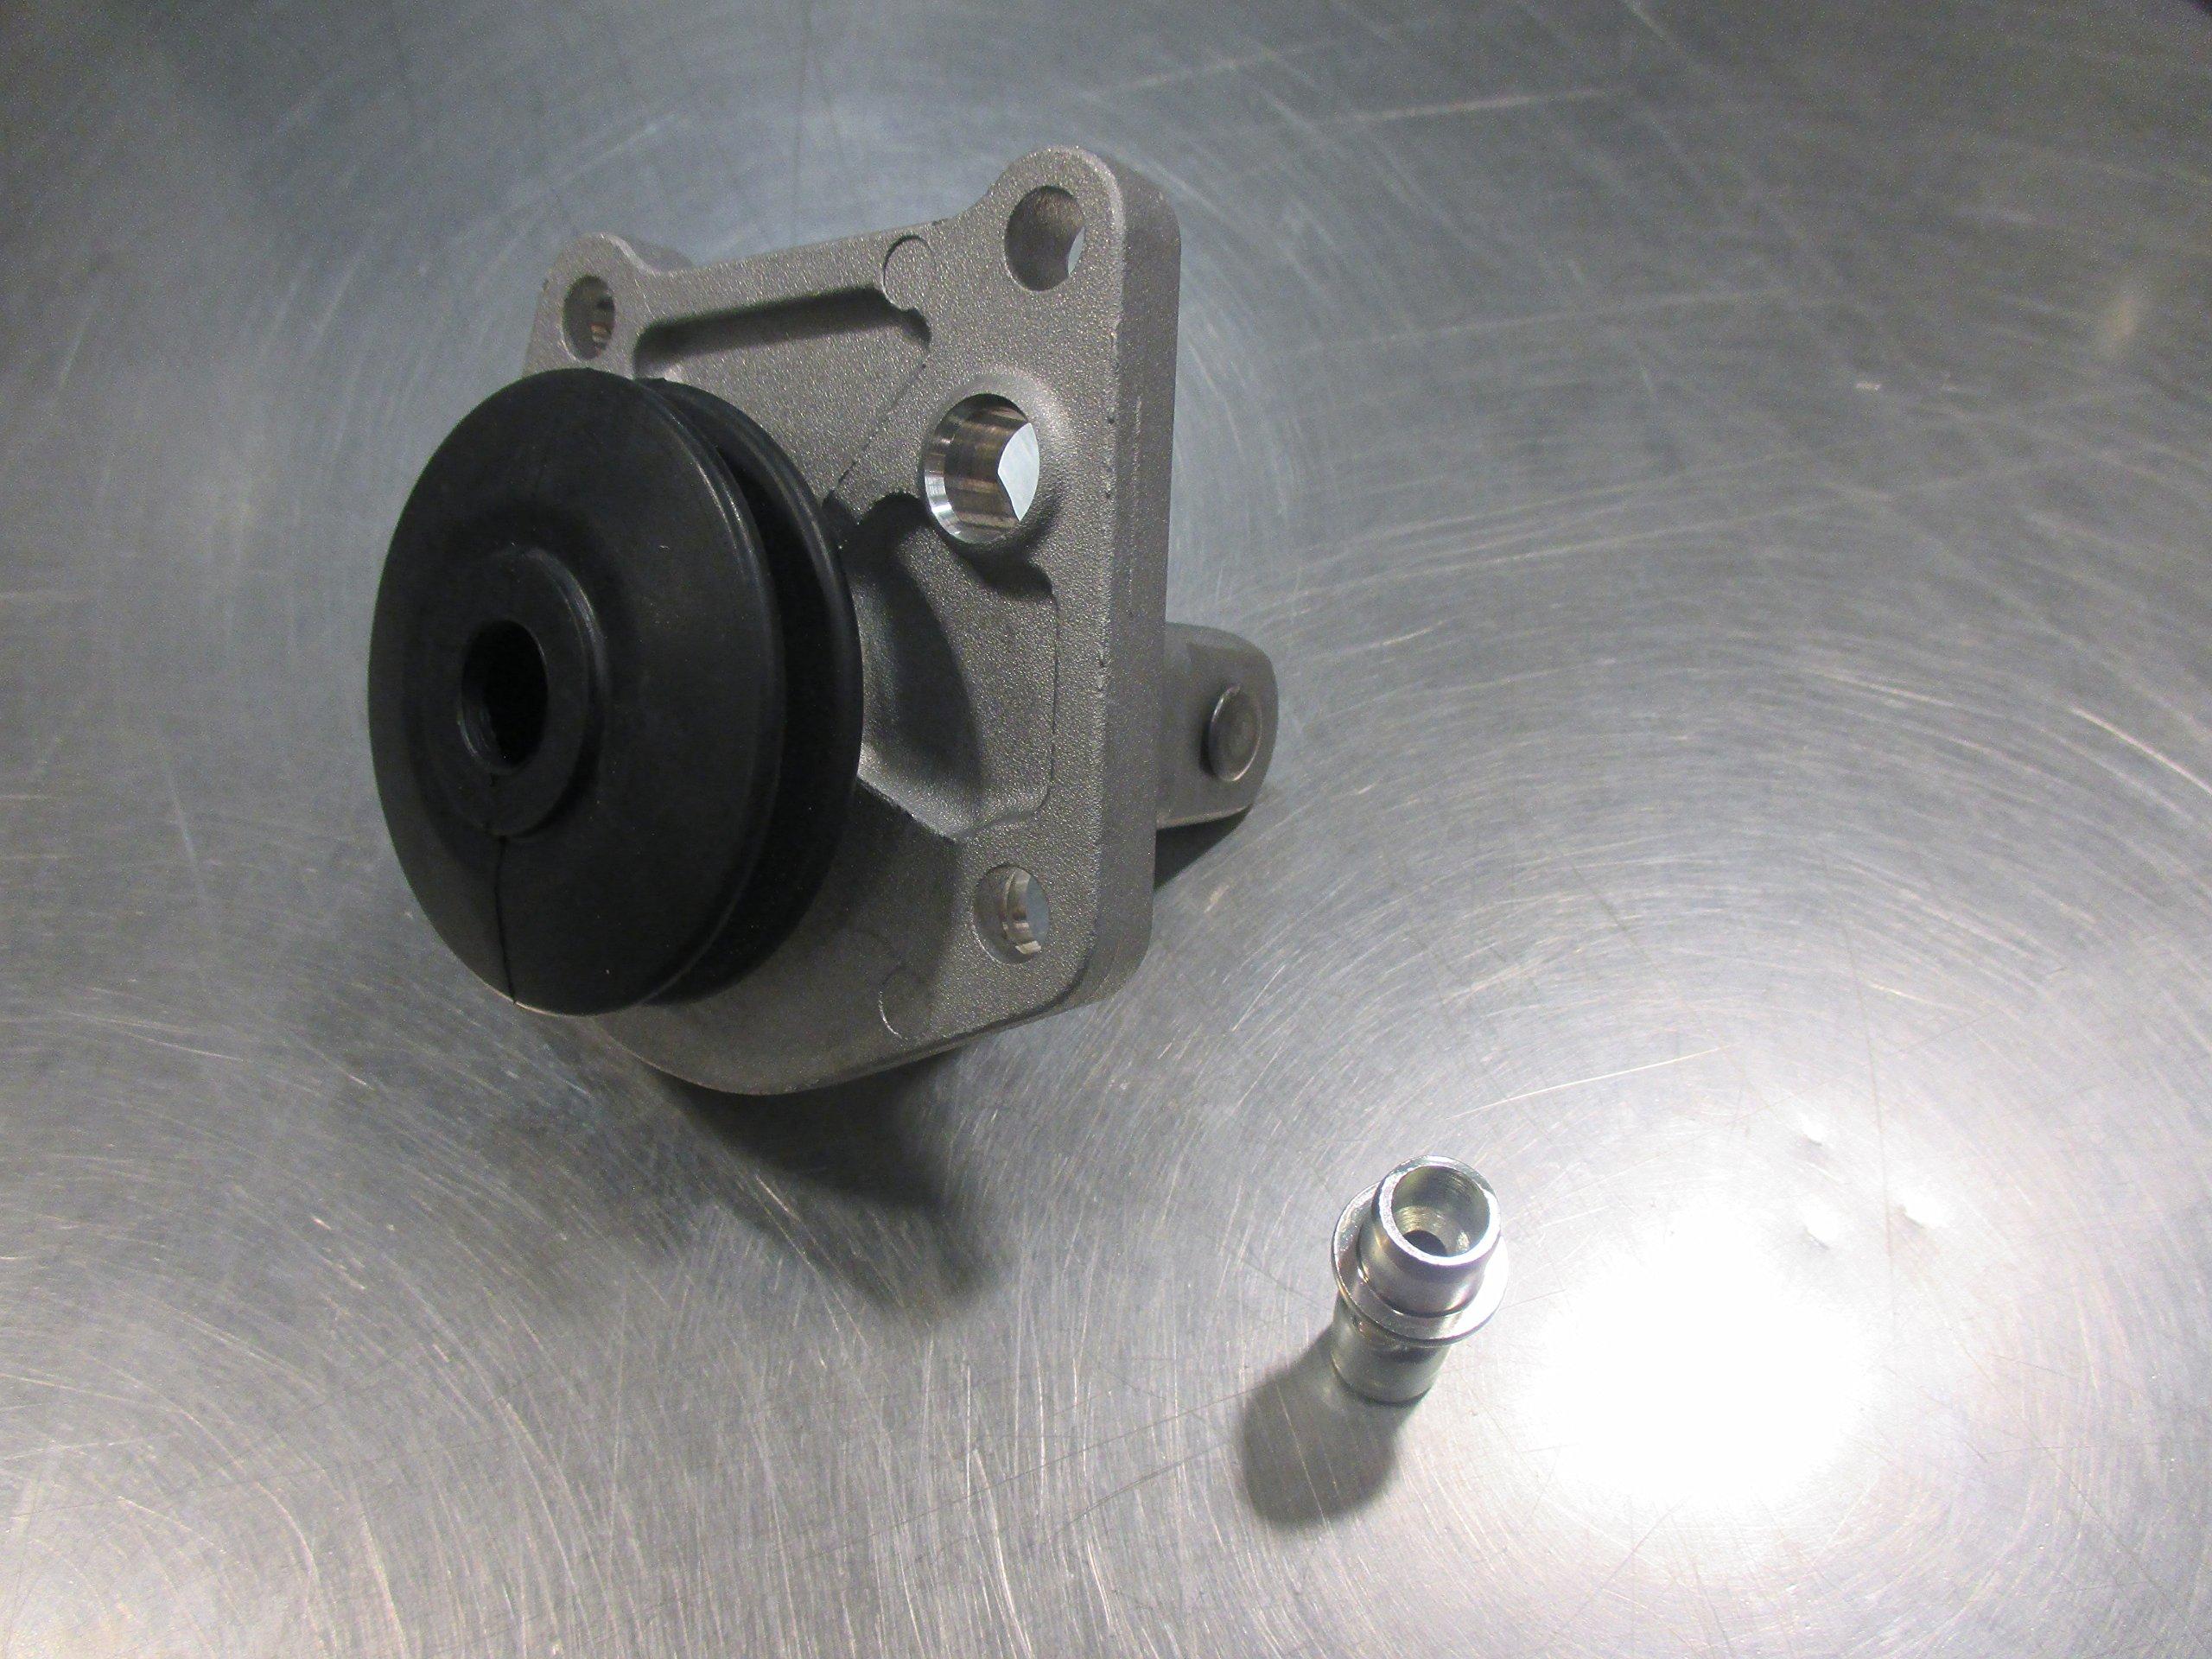 Mazdaspeed 3 & Mazdaspeed 6 New OEM shifter case assembly breather kit